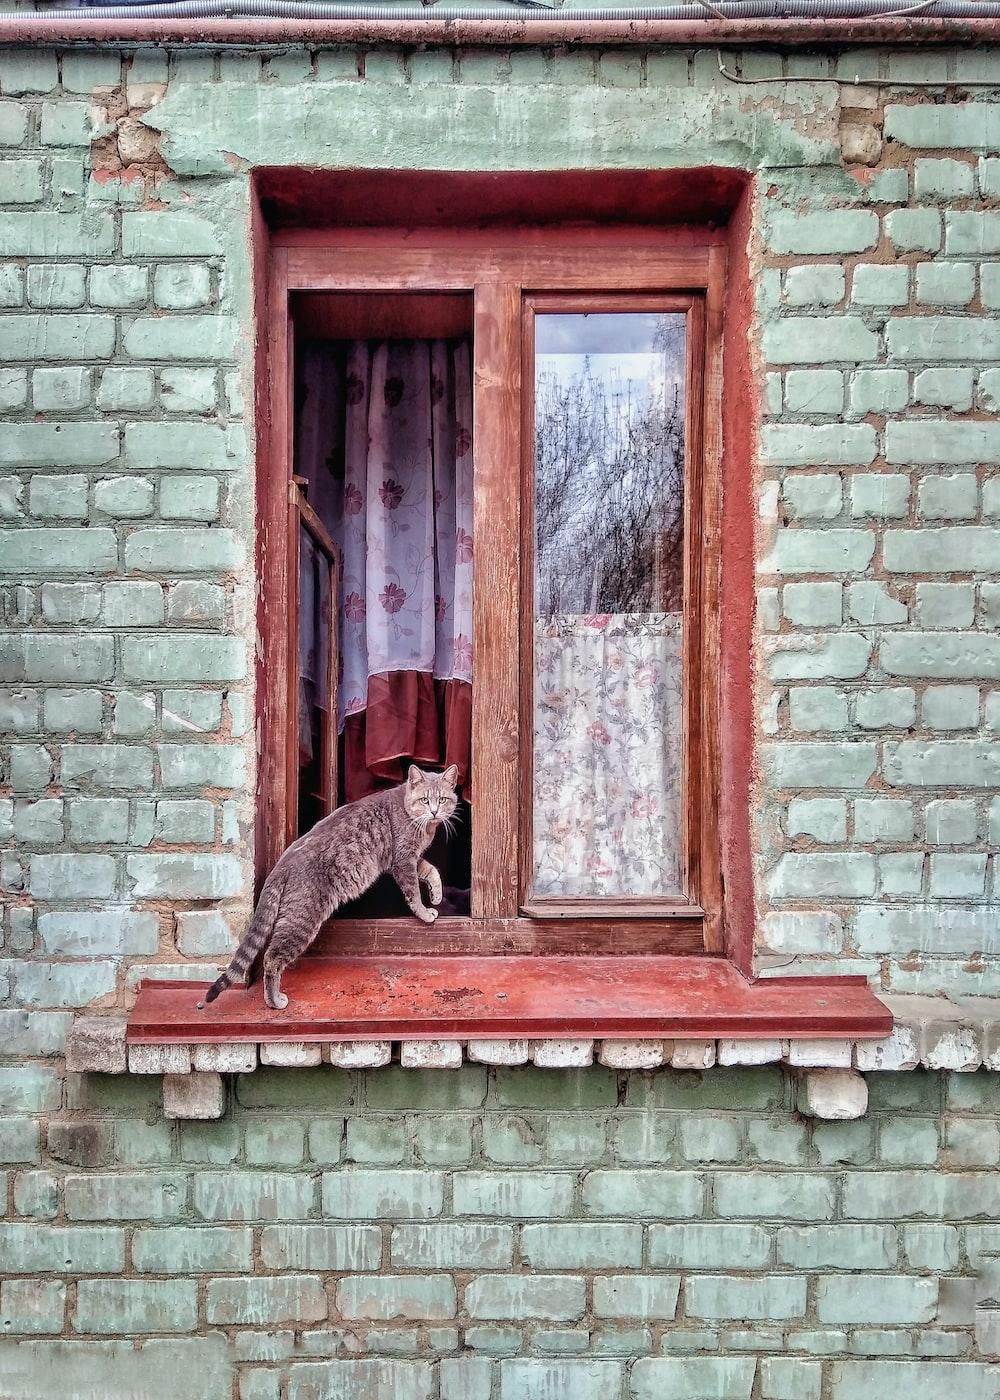 gray tabby cat on a brown window